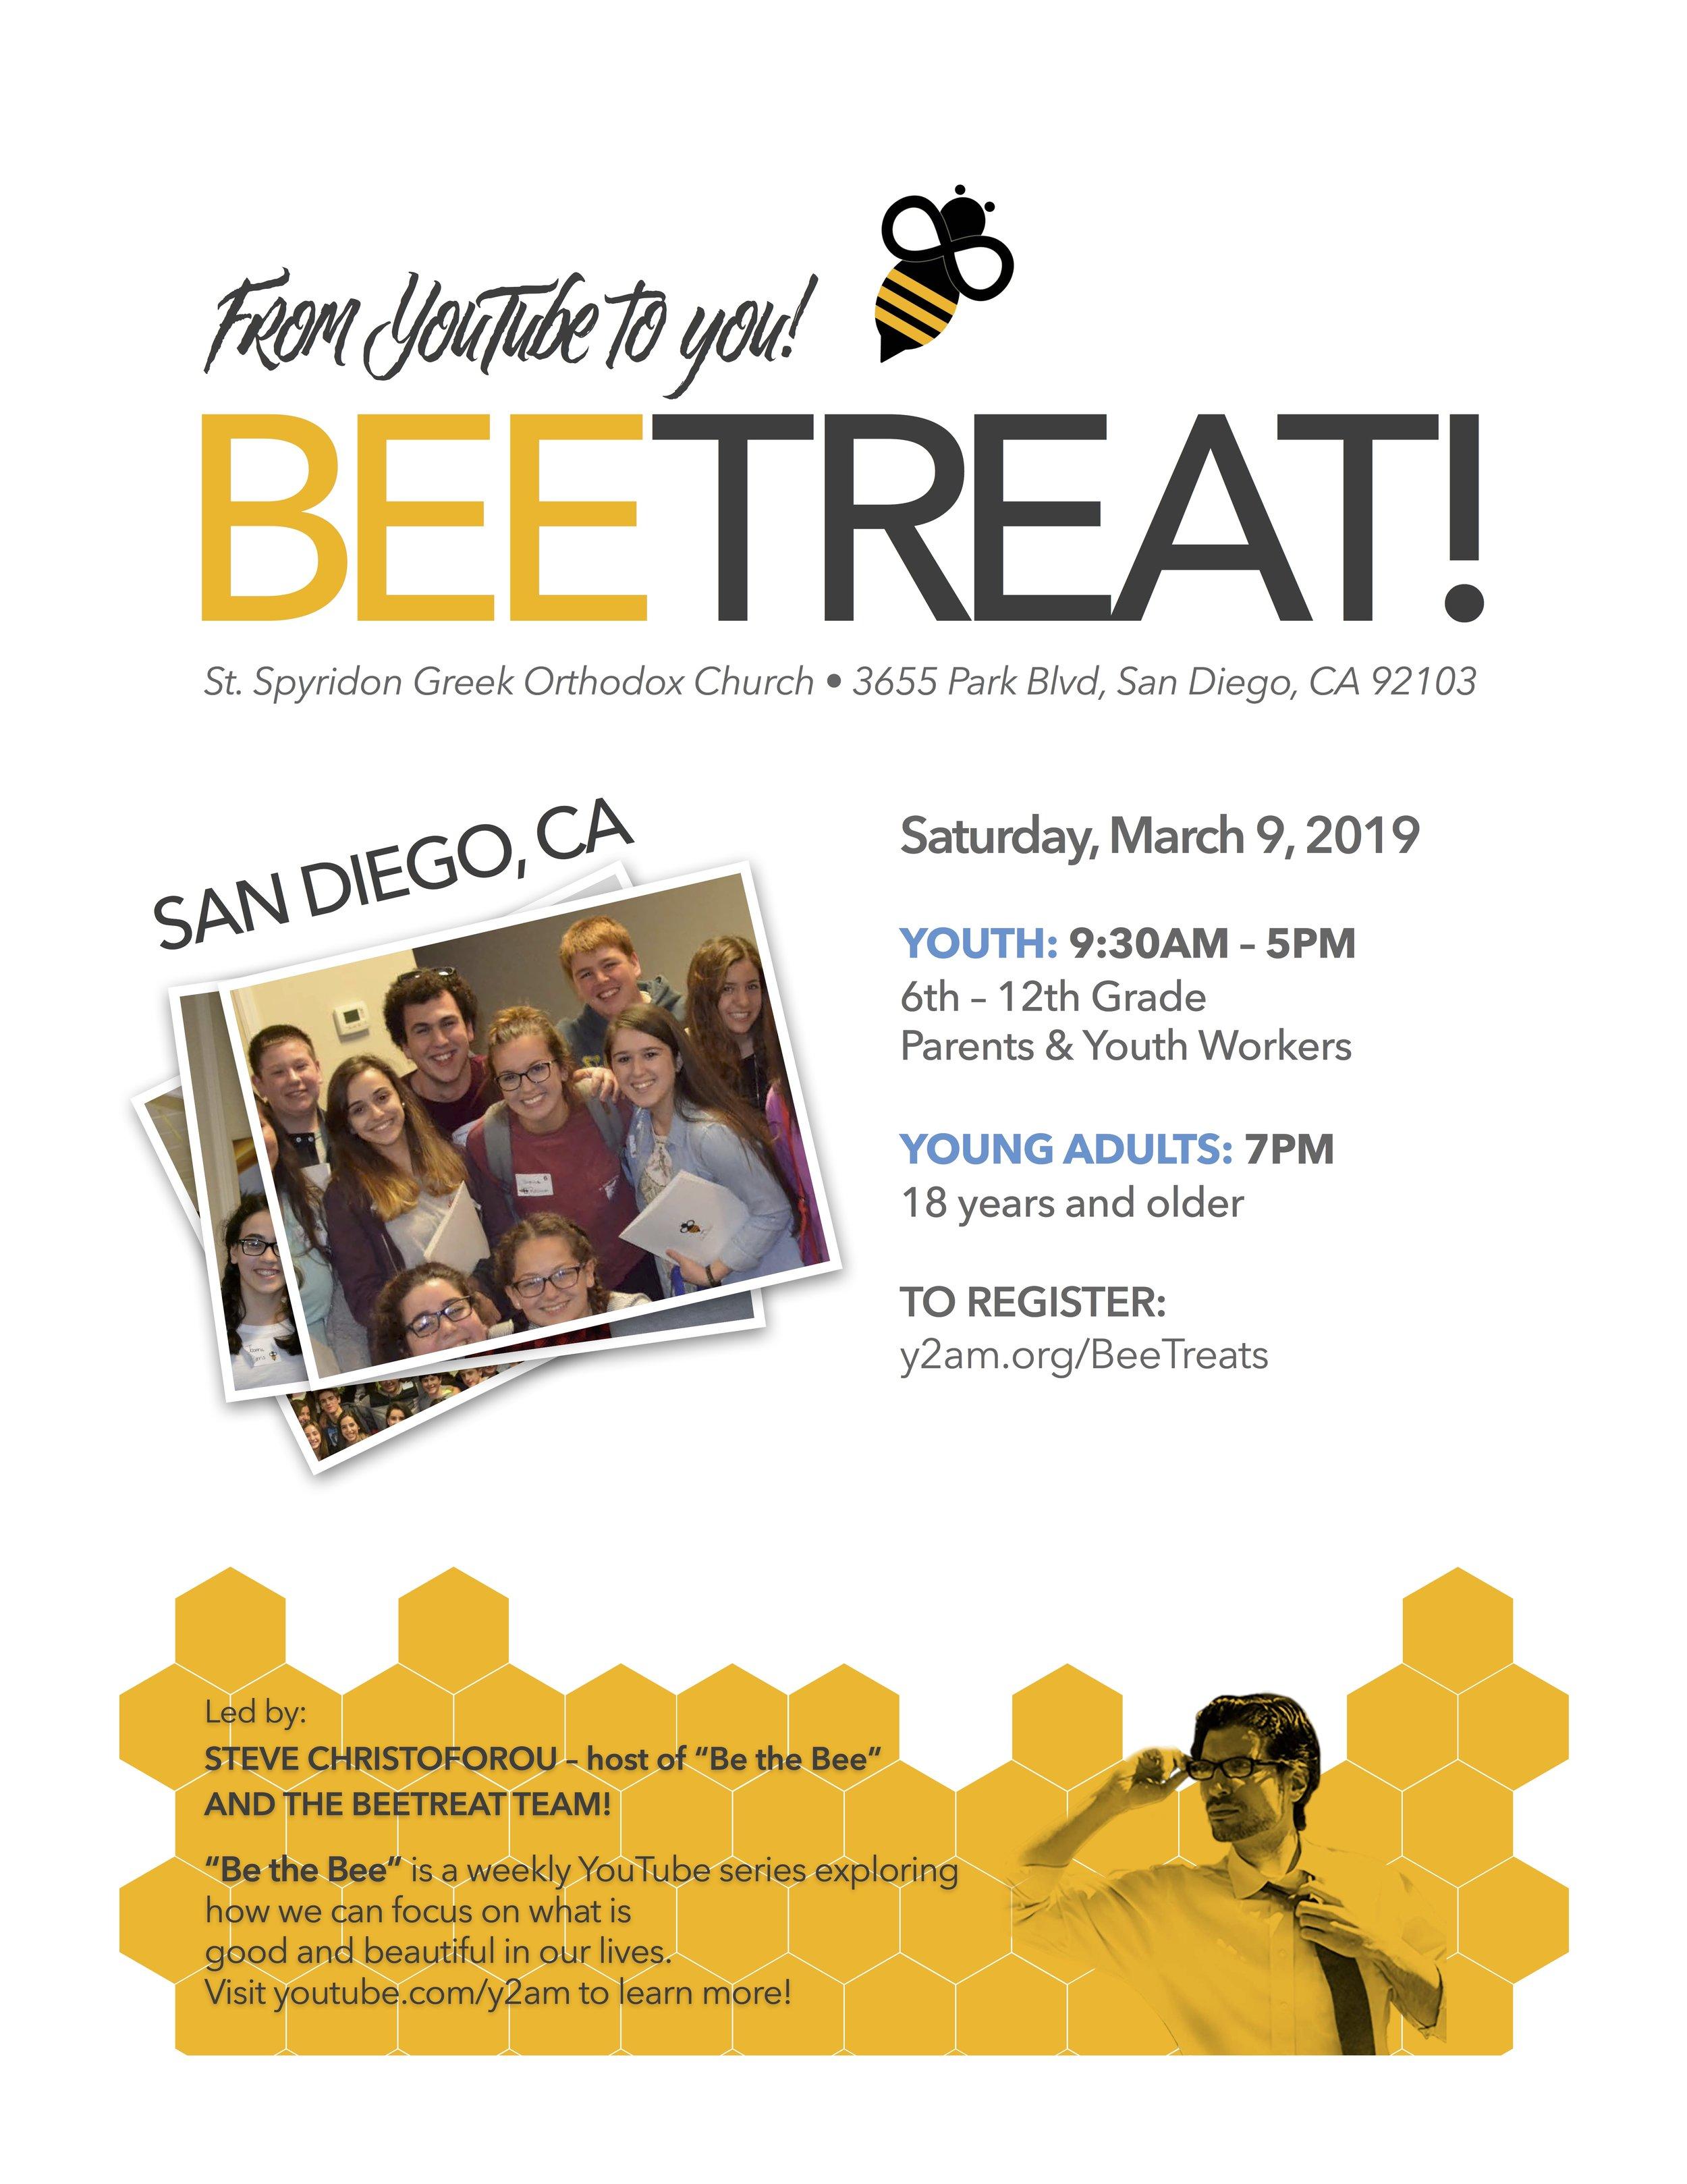 San Diego BeeTreat Flier.jpg